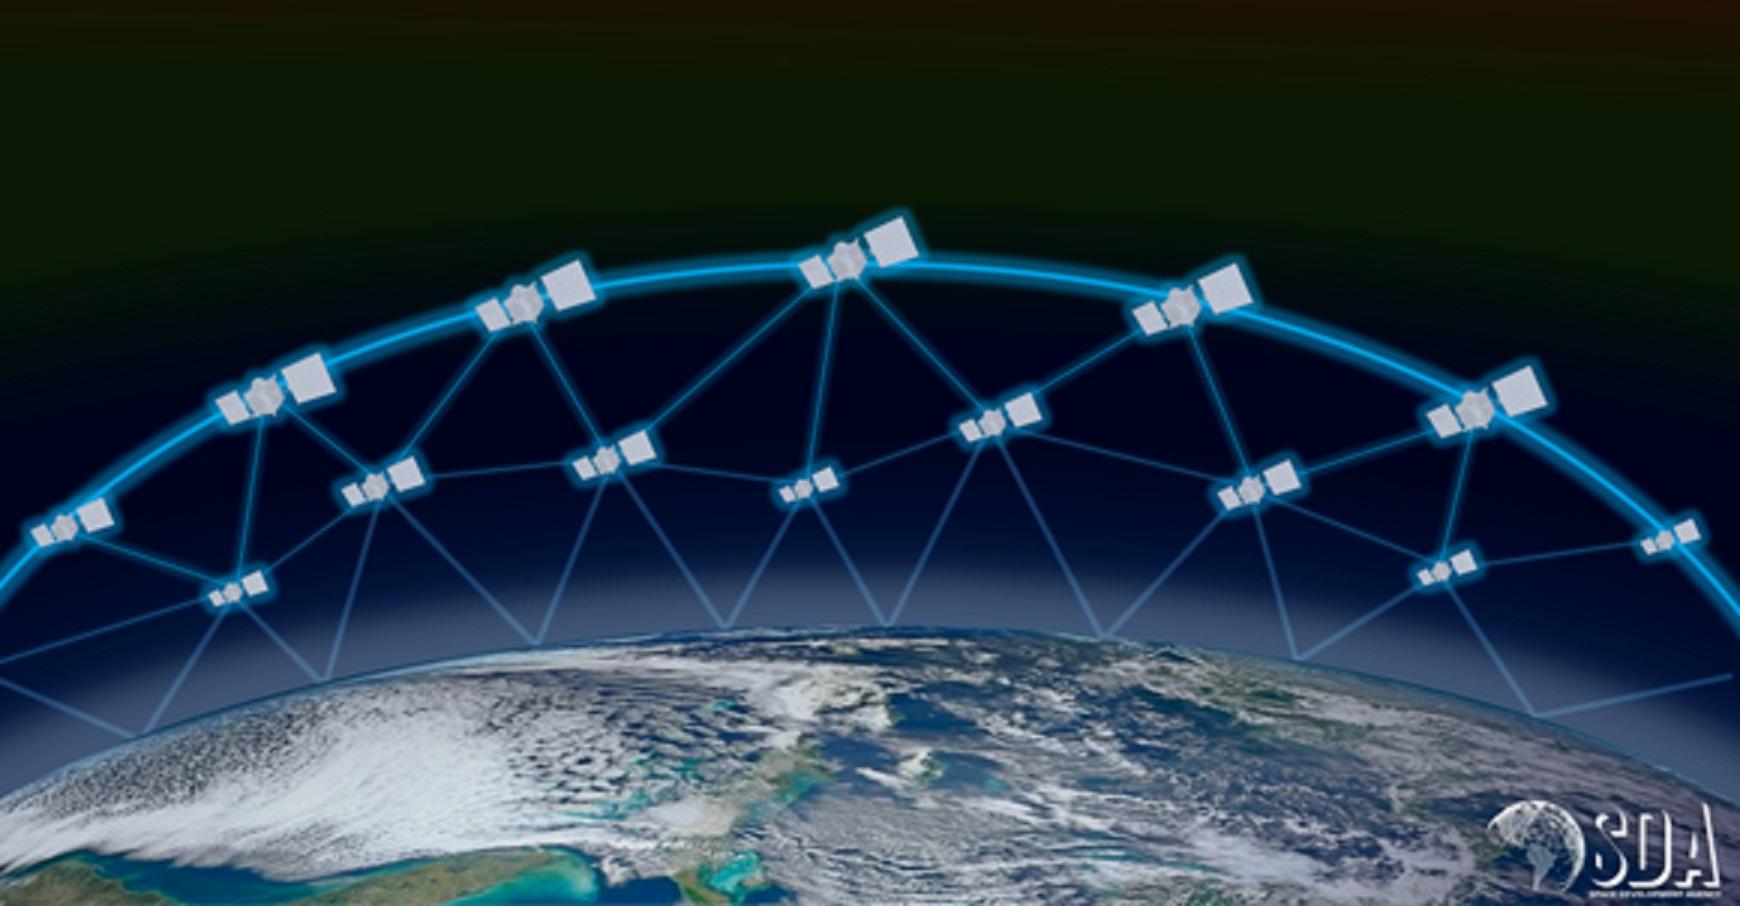 Pentagon awards $282 million for satellite constellation